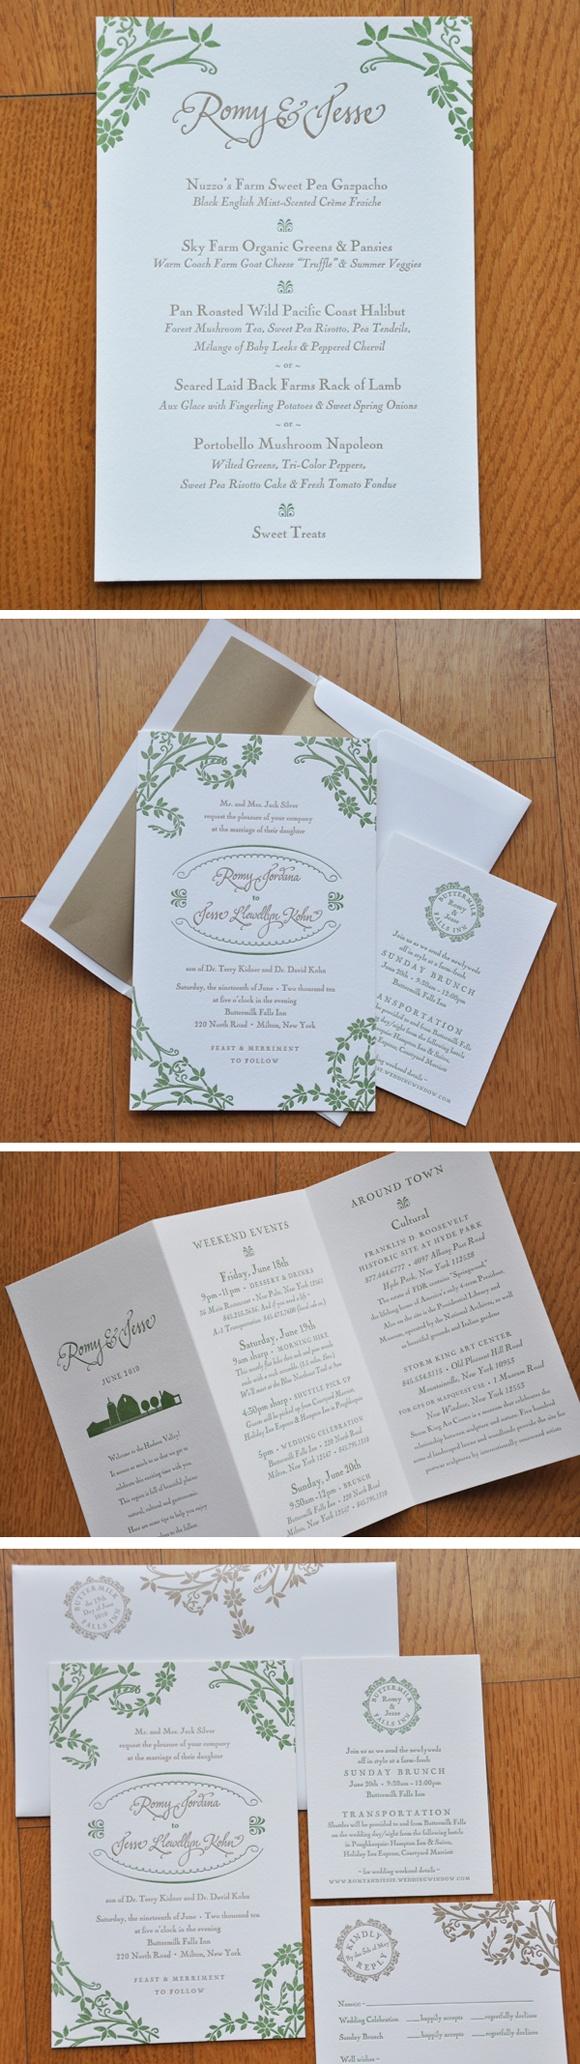 31 Best Secret Garden Wedding Images On Pinterest Weddings Secret